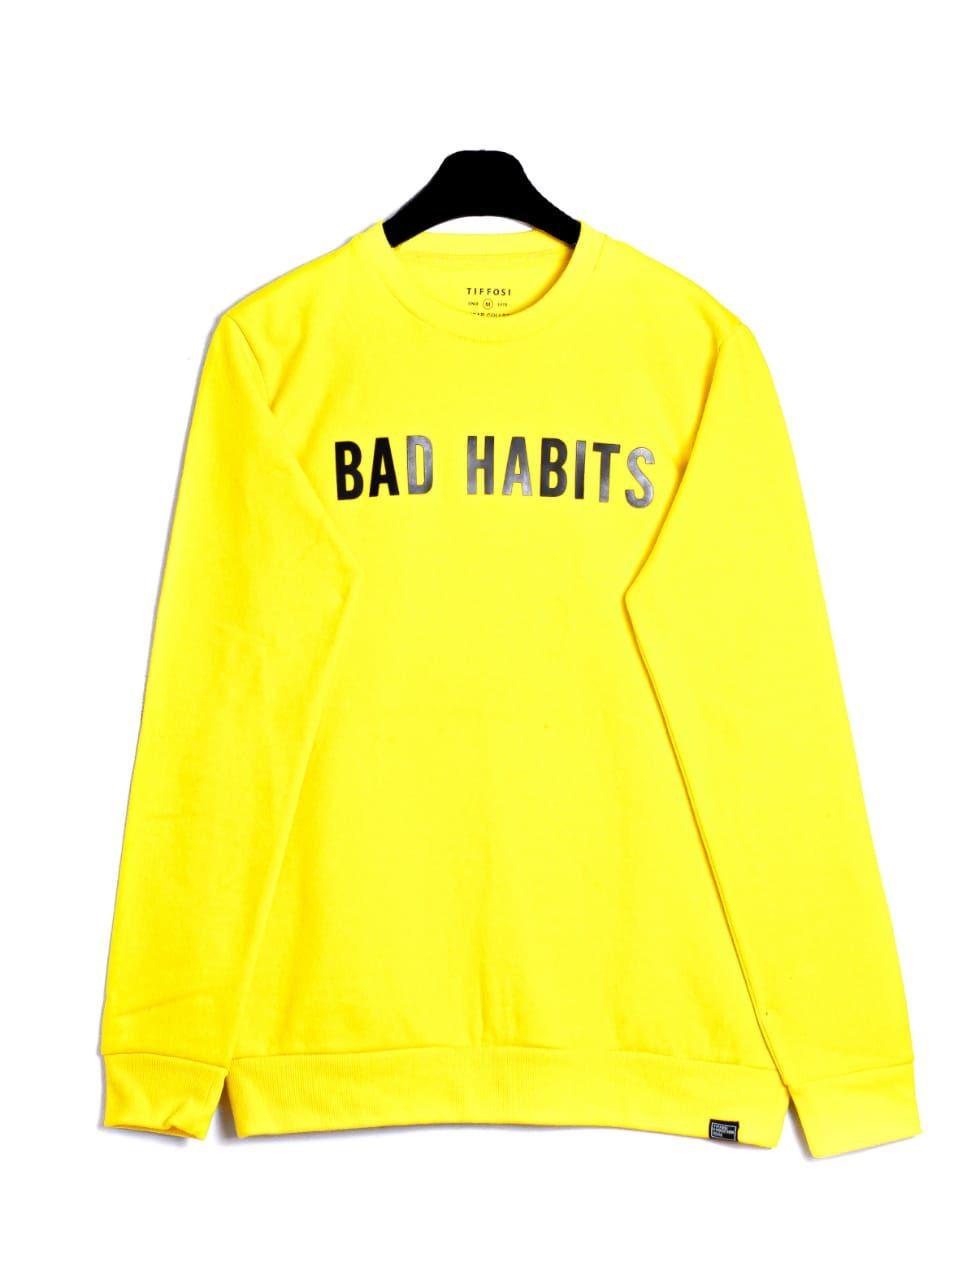 Customized Men's/women's Sweatshirt